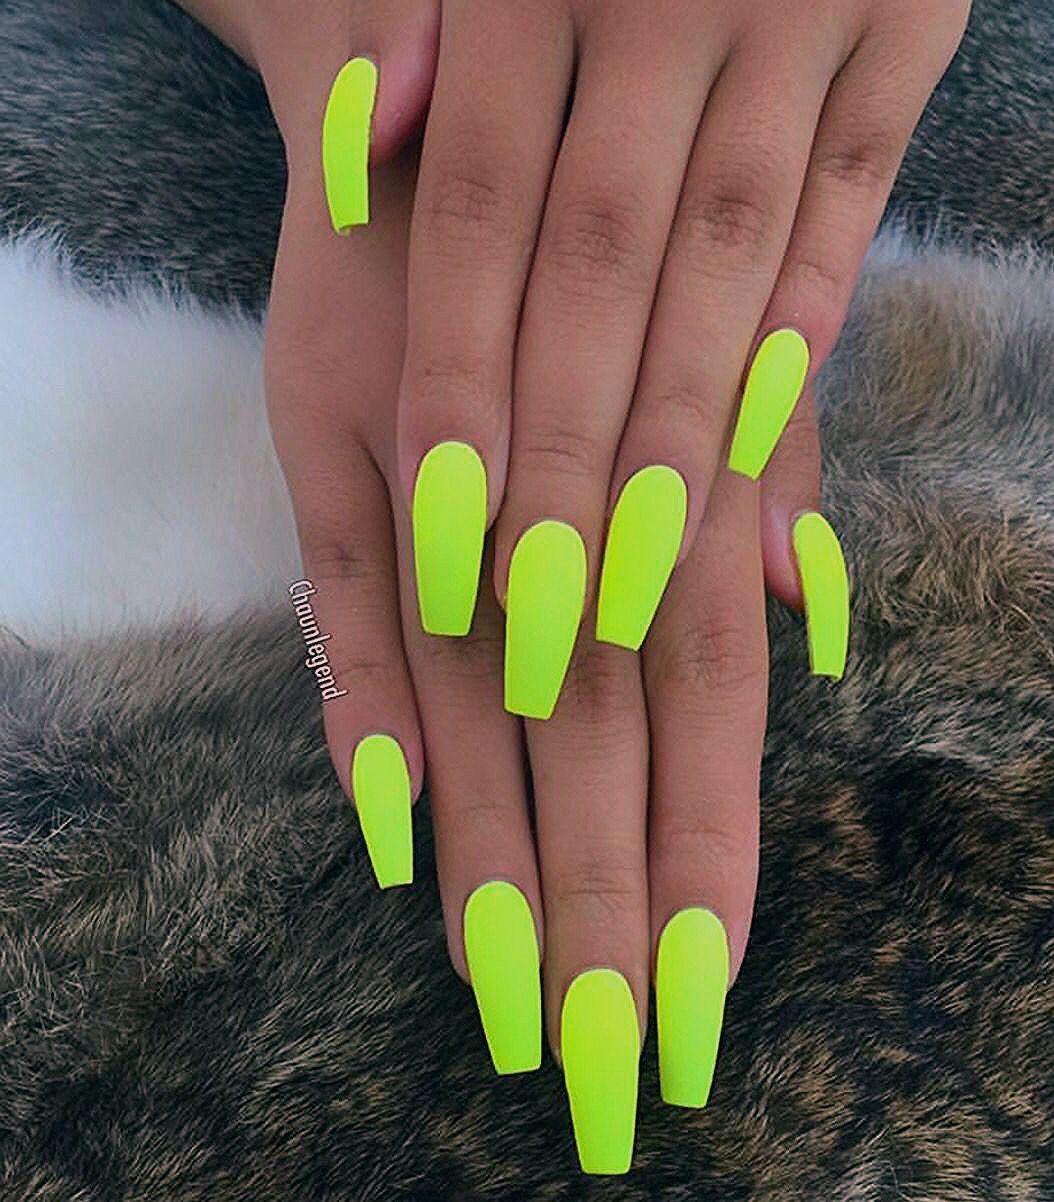 #neon nails neue #trend nail art inspirierende ideen